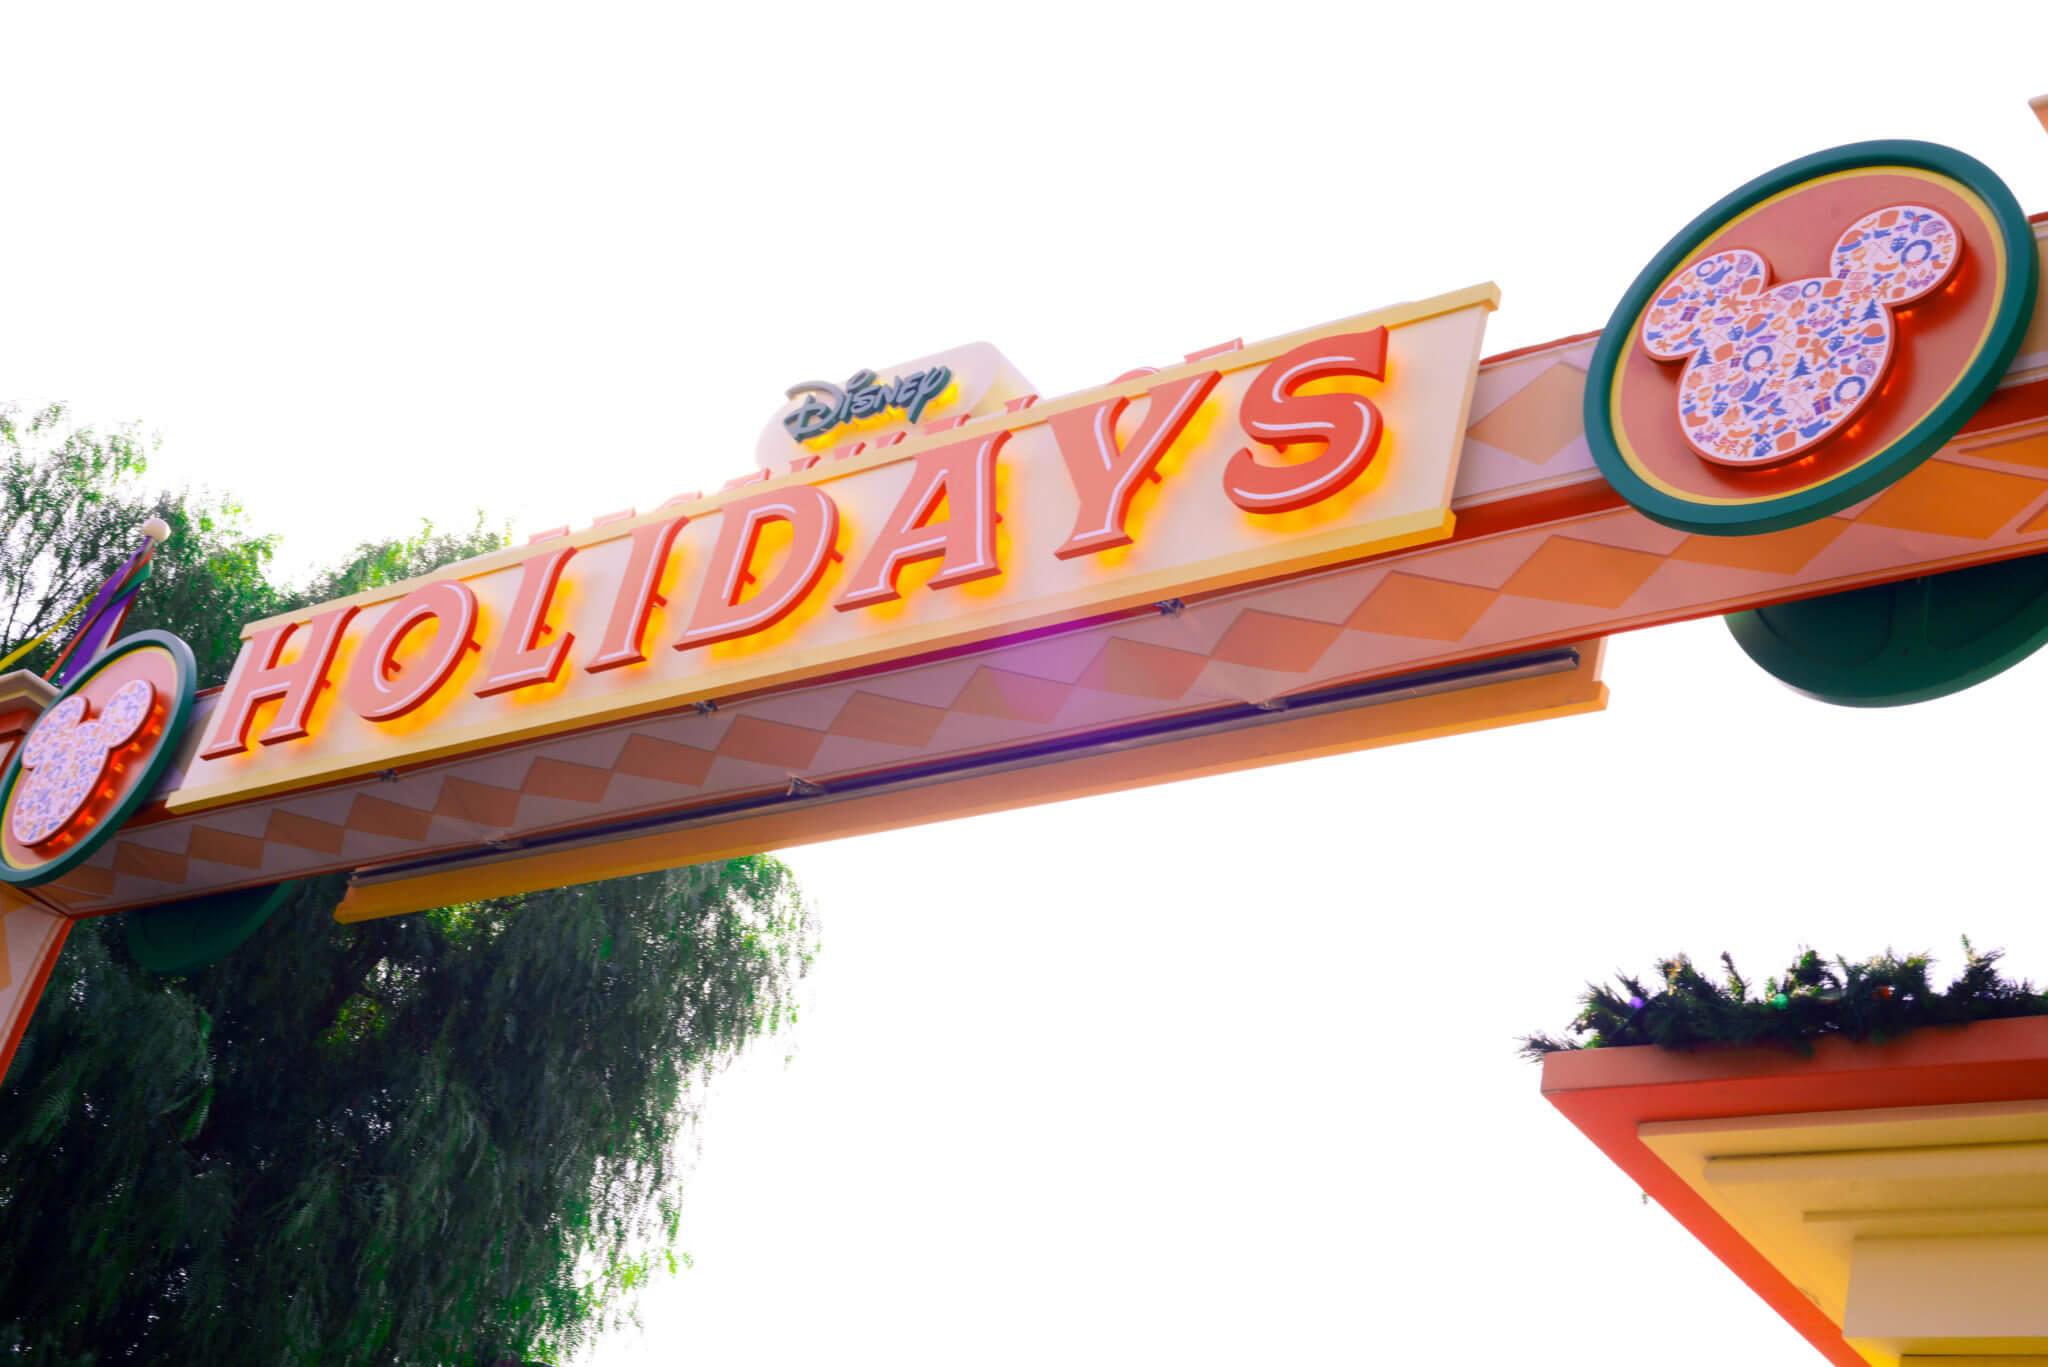 Festival of Holidays Sign California Adventure